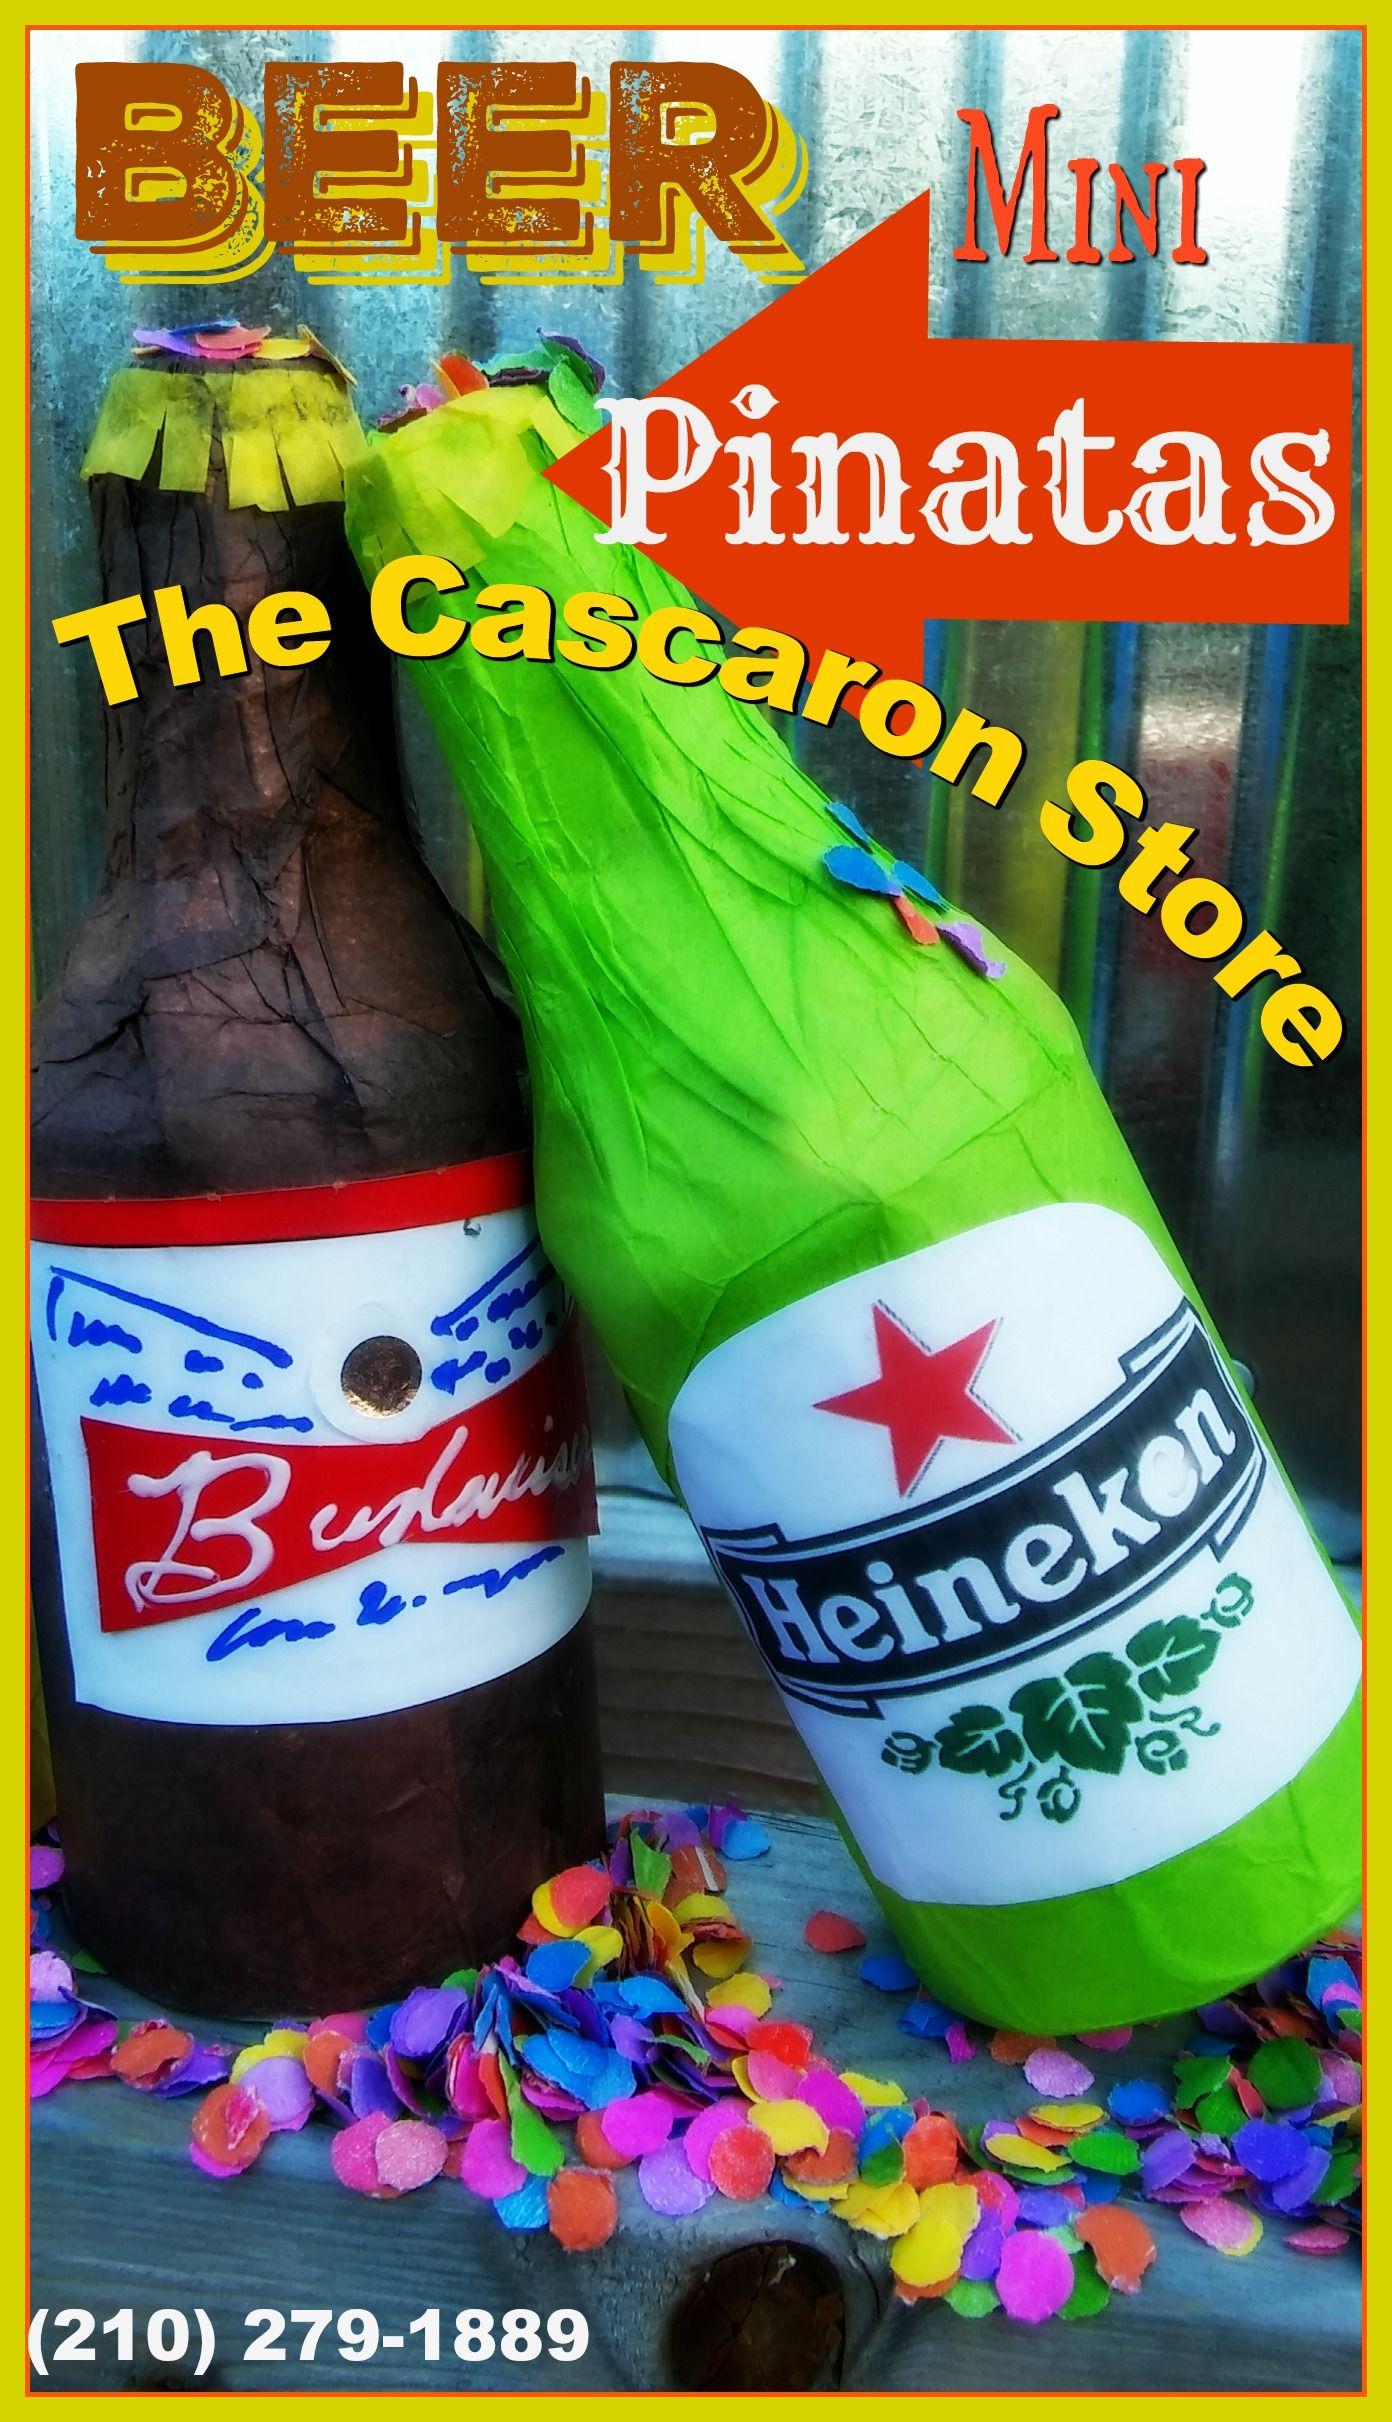 Beer Mini Pinatas, fiesta theme party decorations, fiesta